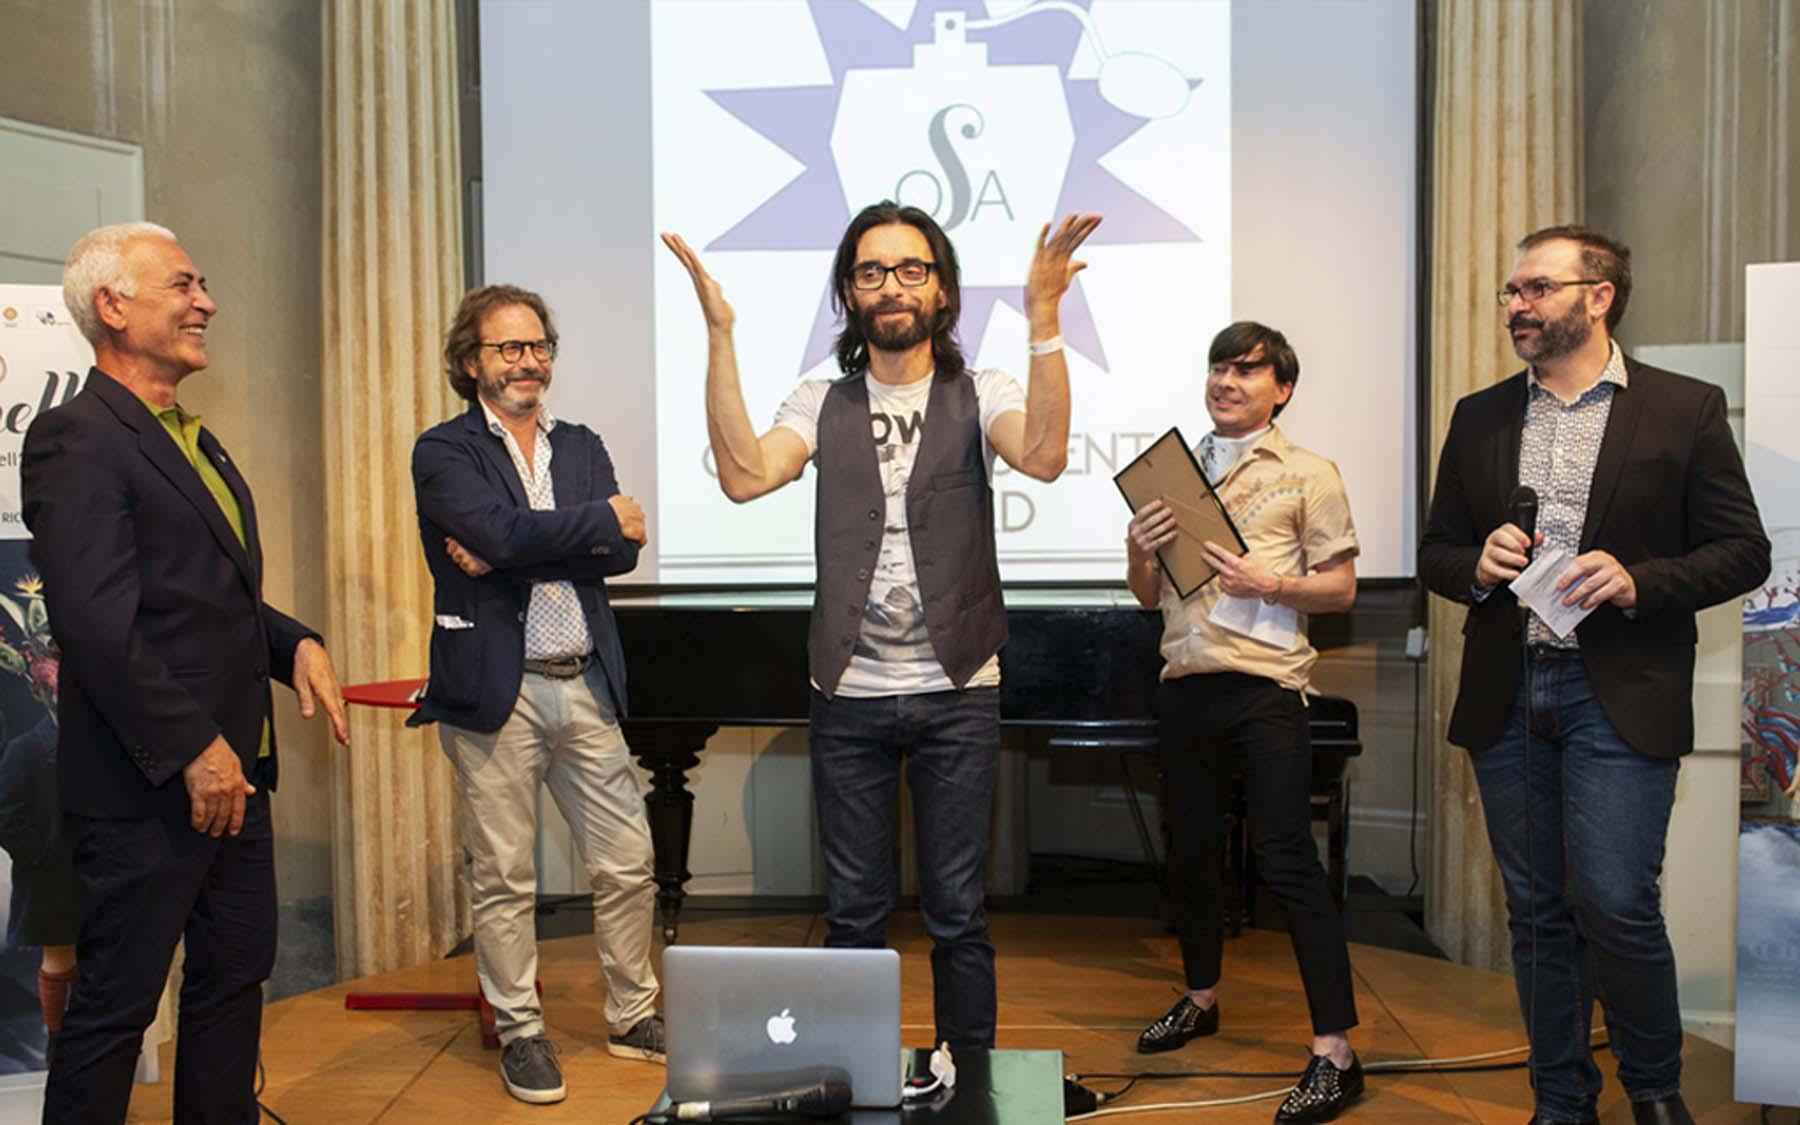 Marco Ceravolo winner - OSA! Award 2018